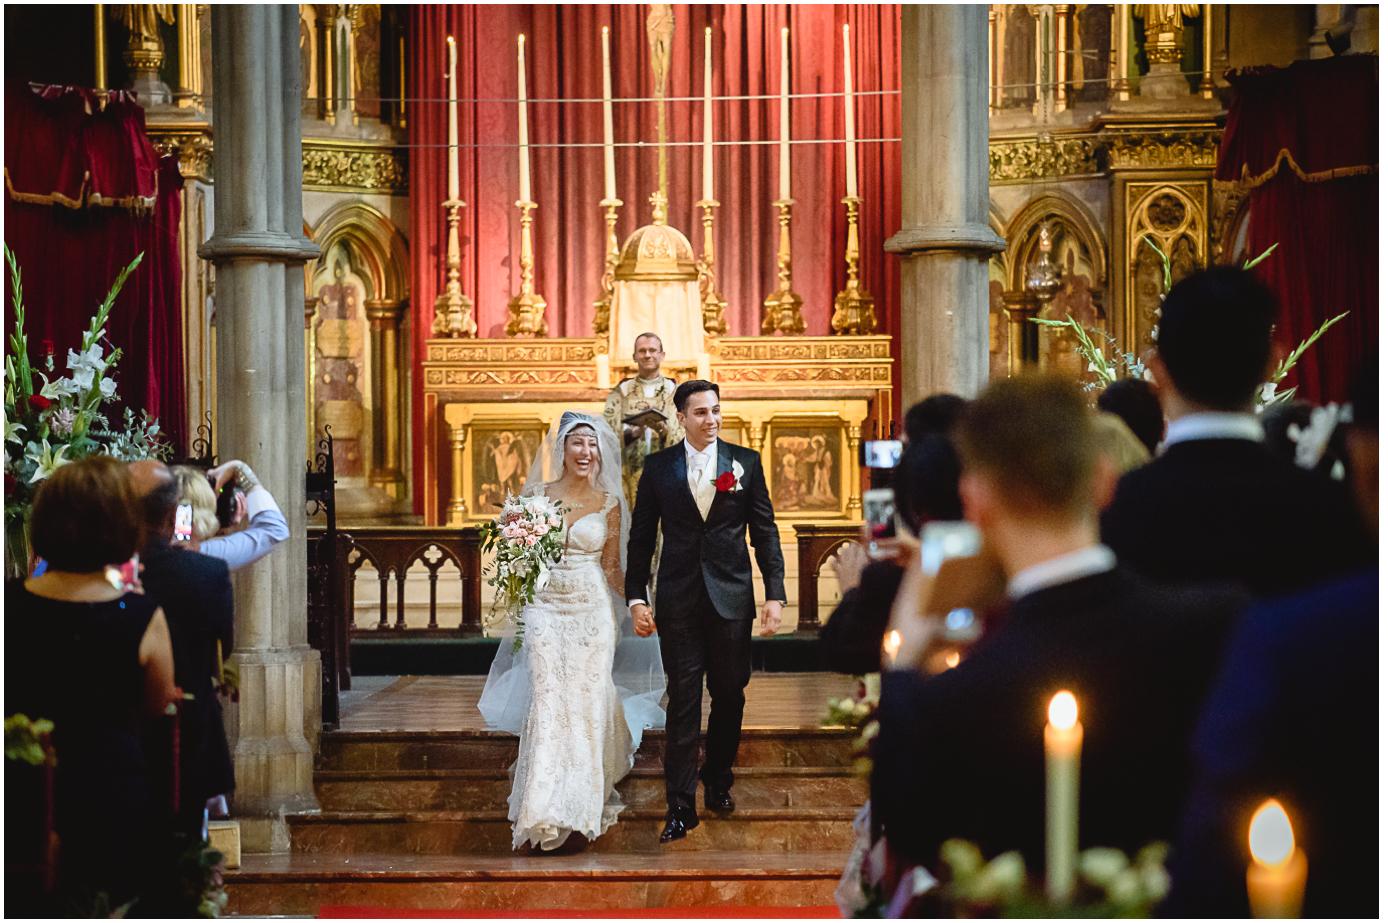 iranian wedding photographer 99 - Drapers Hall London Wedding Photographer